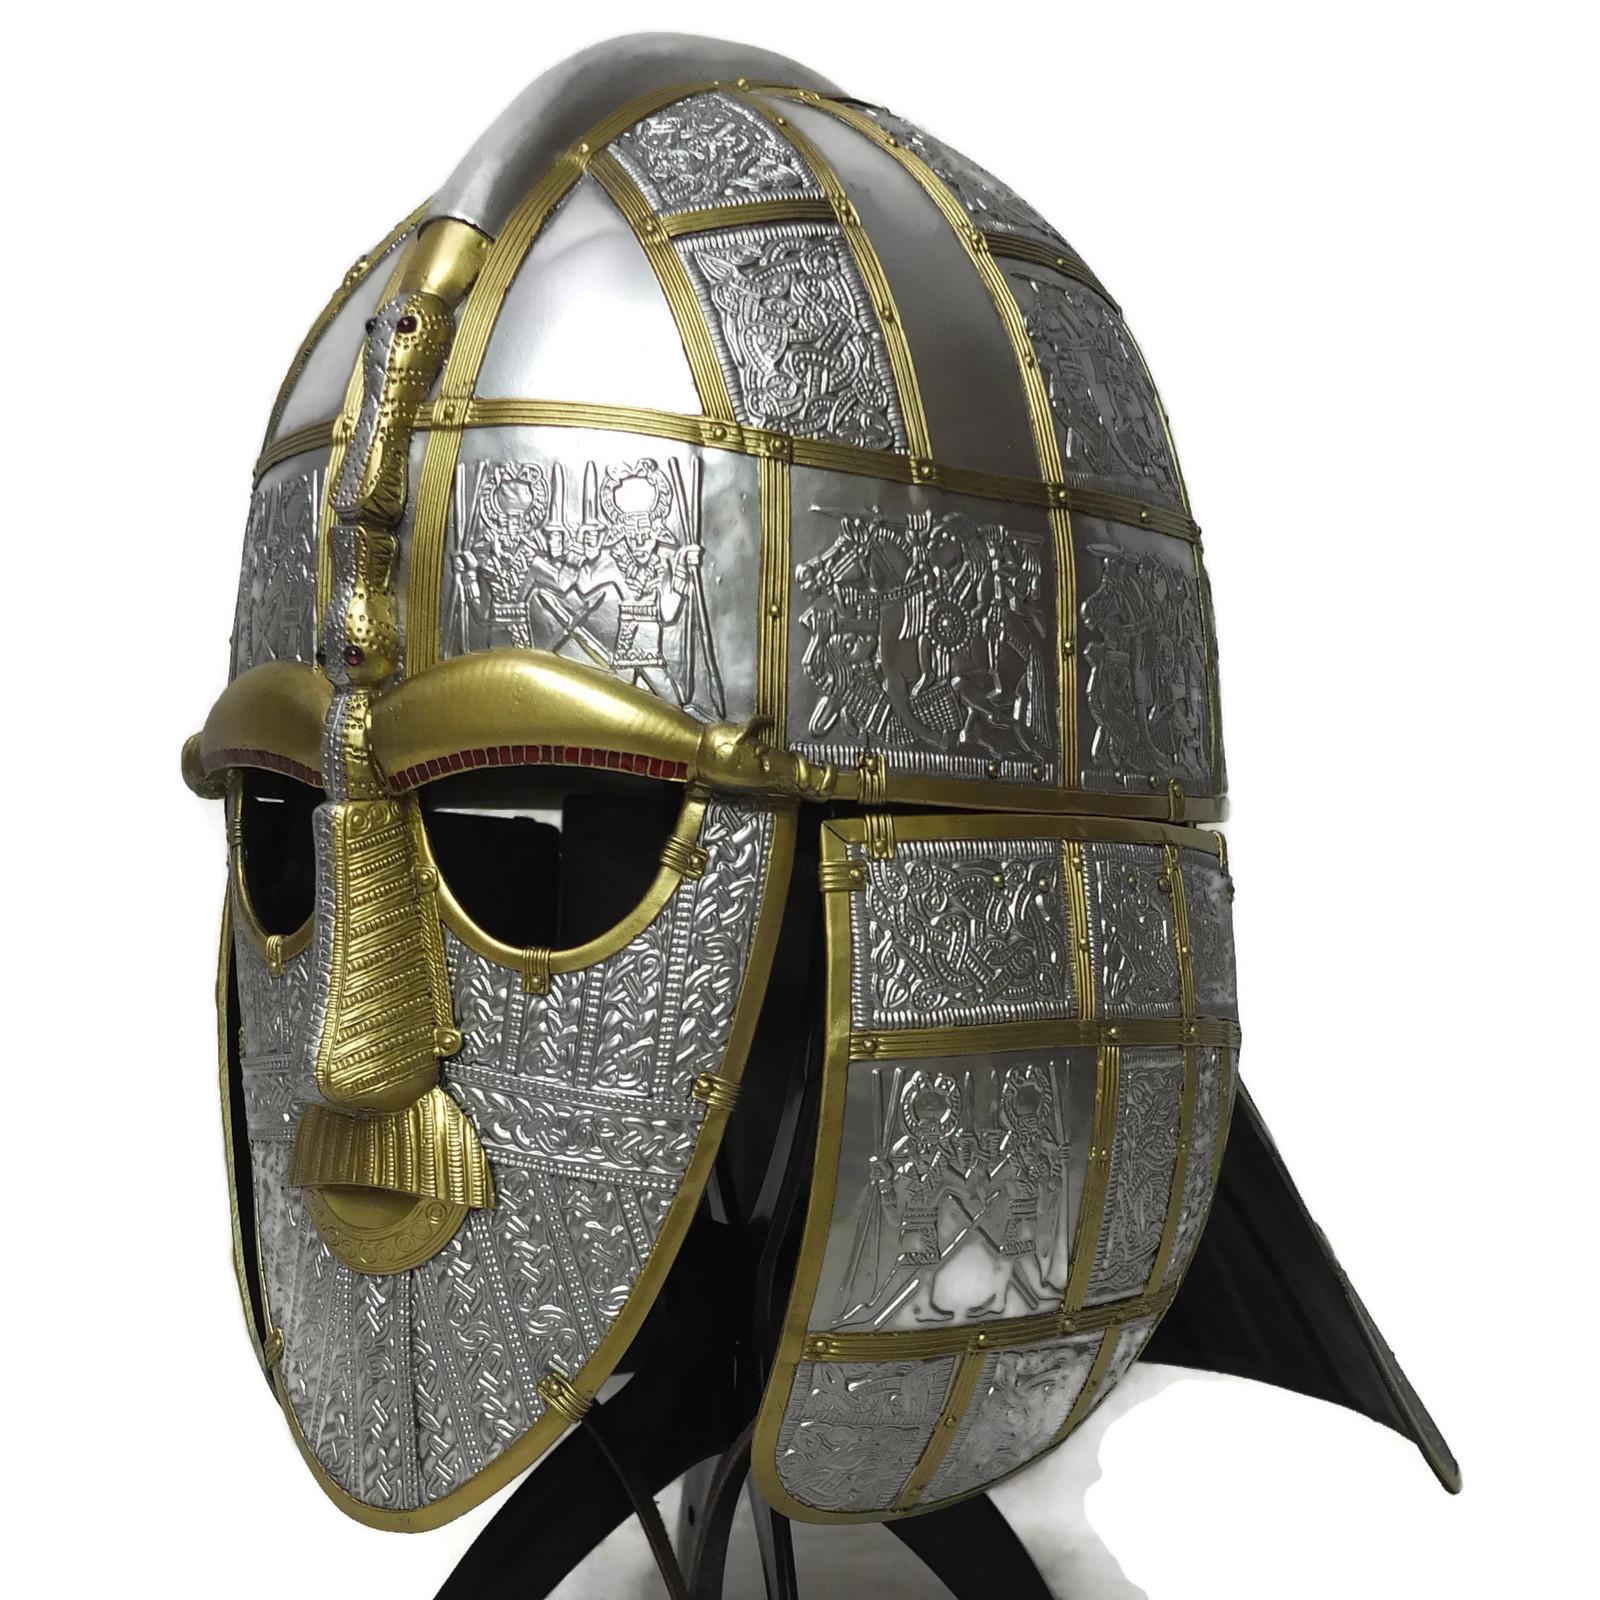 Larp armour sutton hoo helmet for The sutton